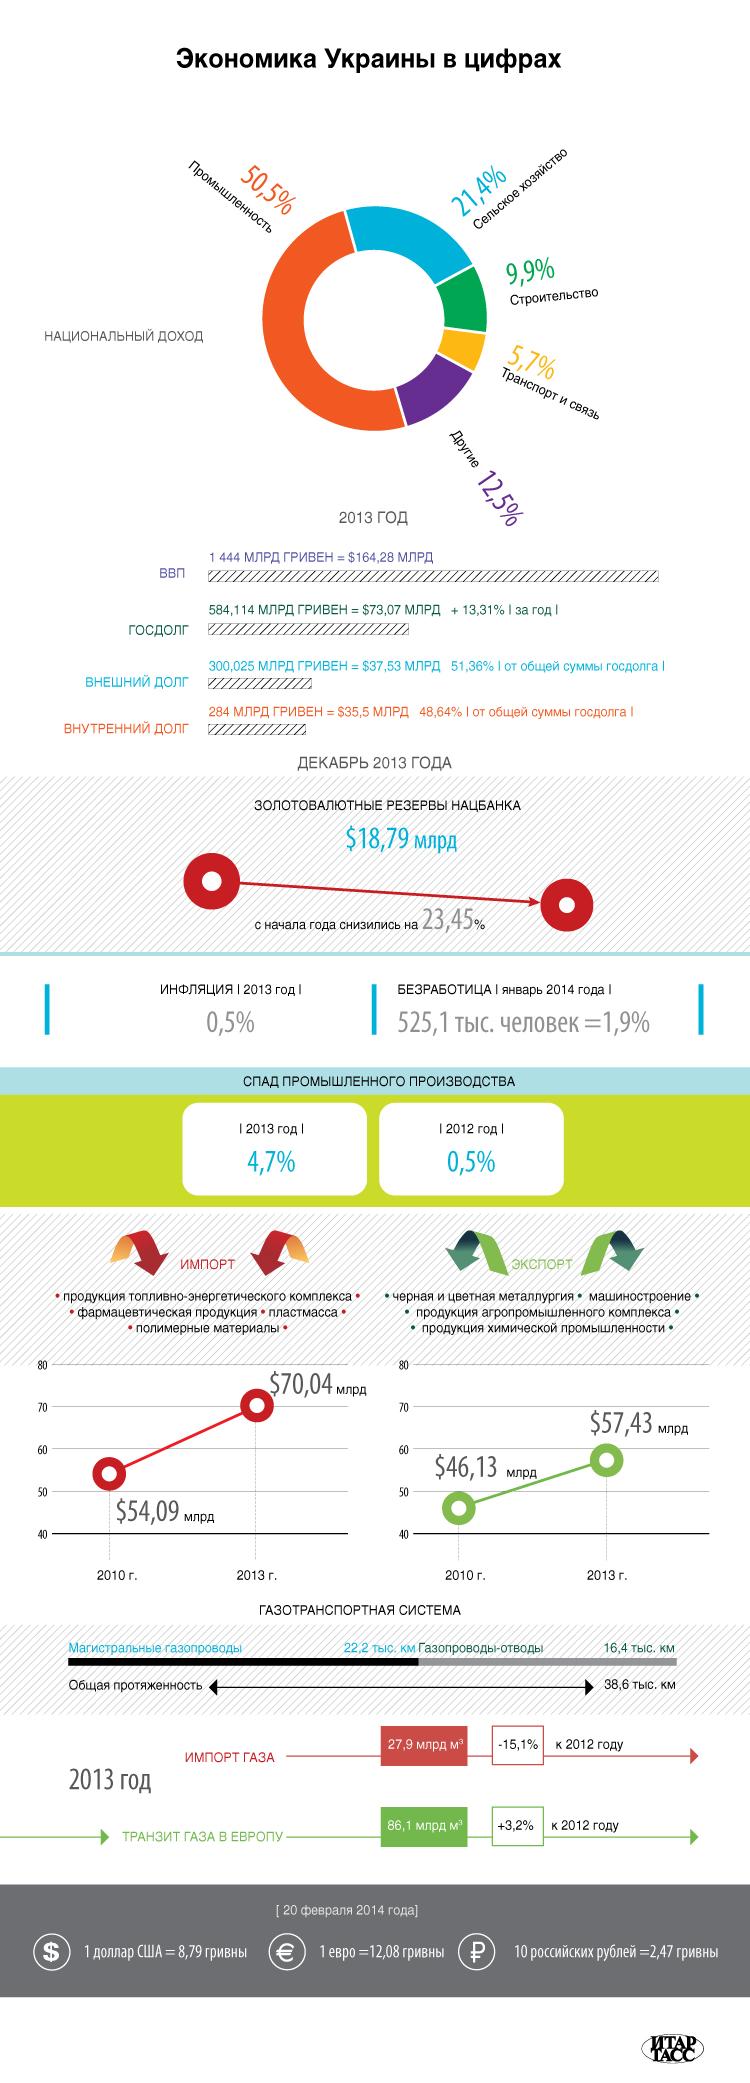 Экономика Украины в цифрах